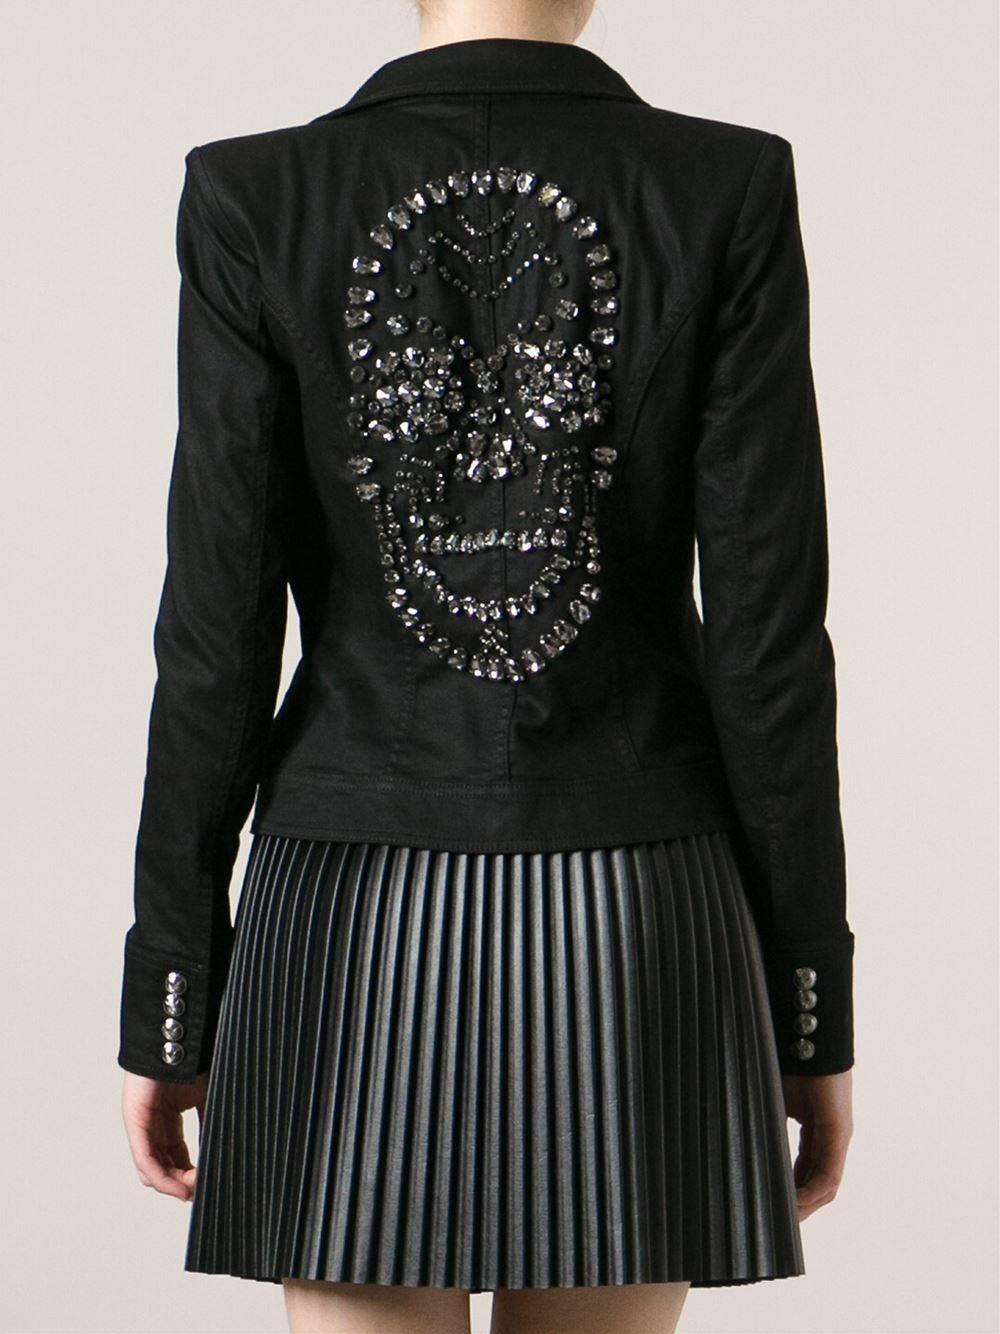 miglior servizio c7242 f0de4 Philipp Plein Skull Embellished Jacket   My love for skulls ...